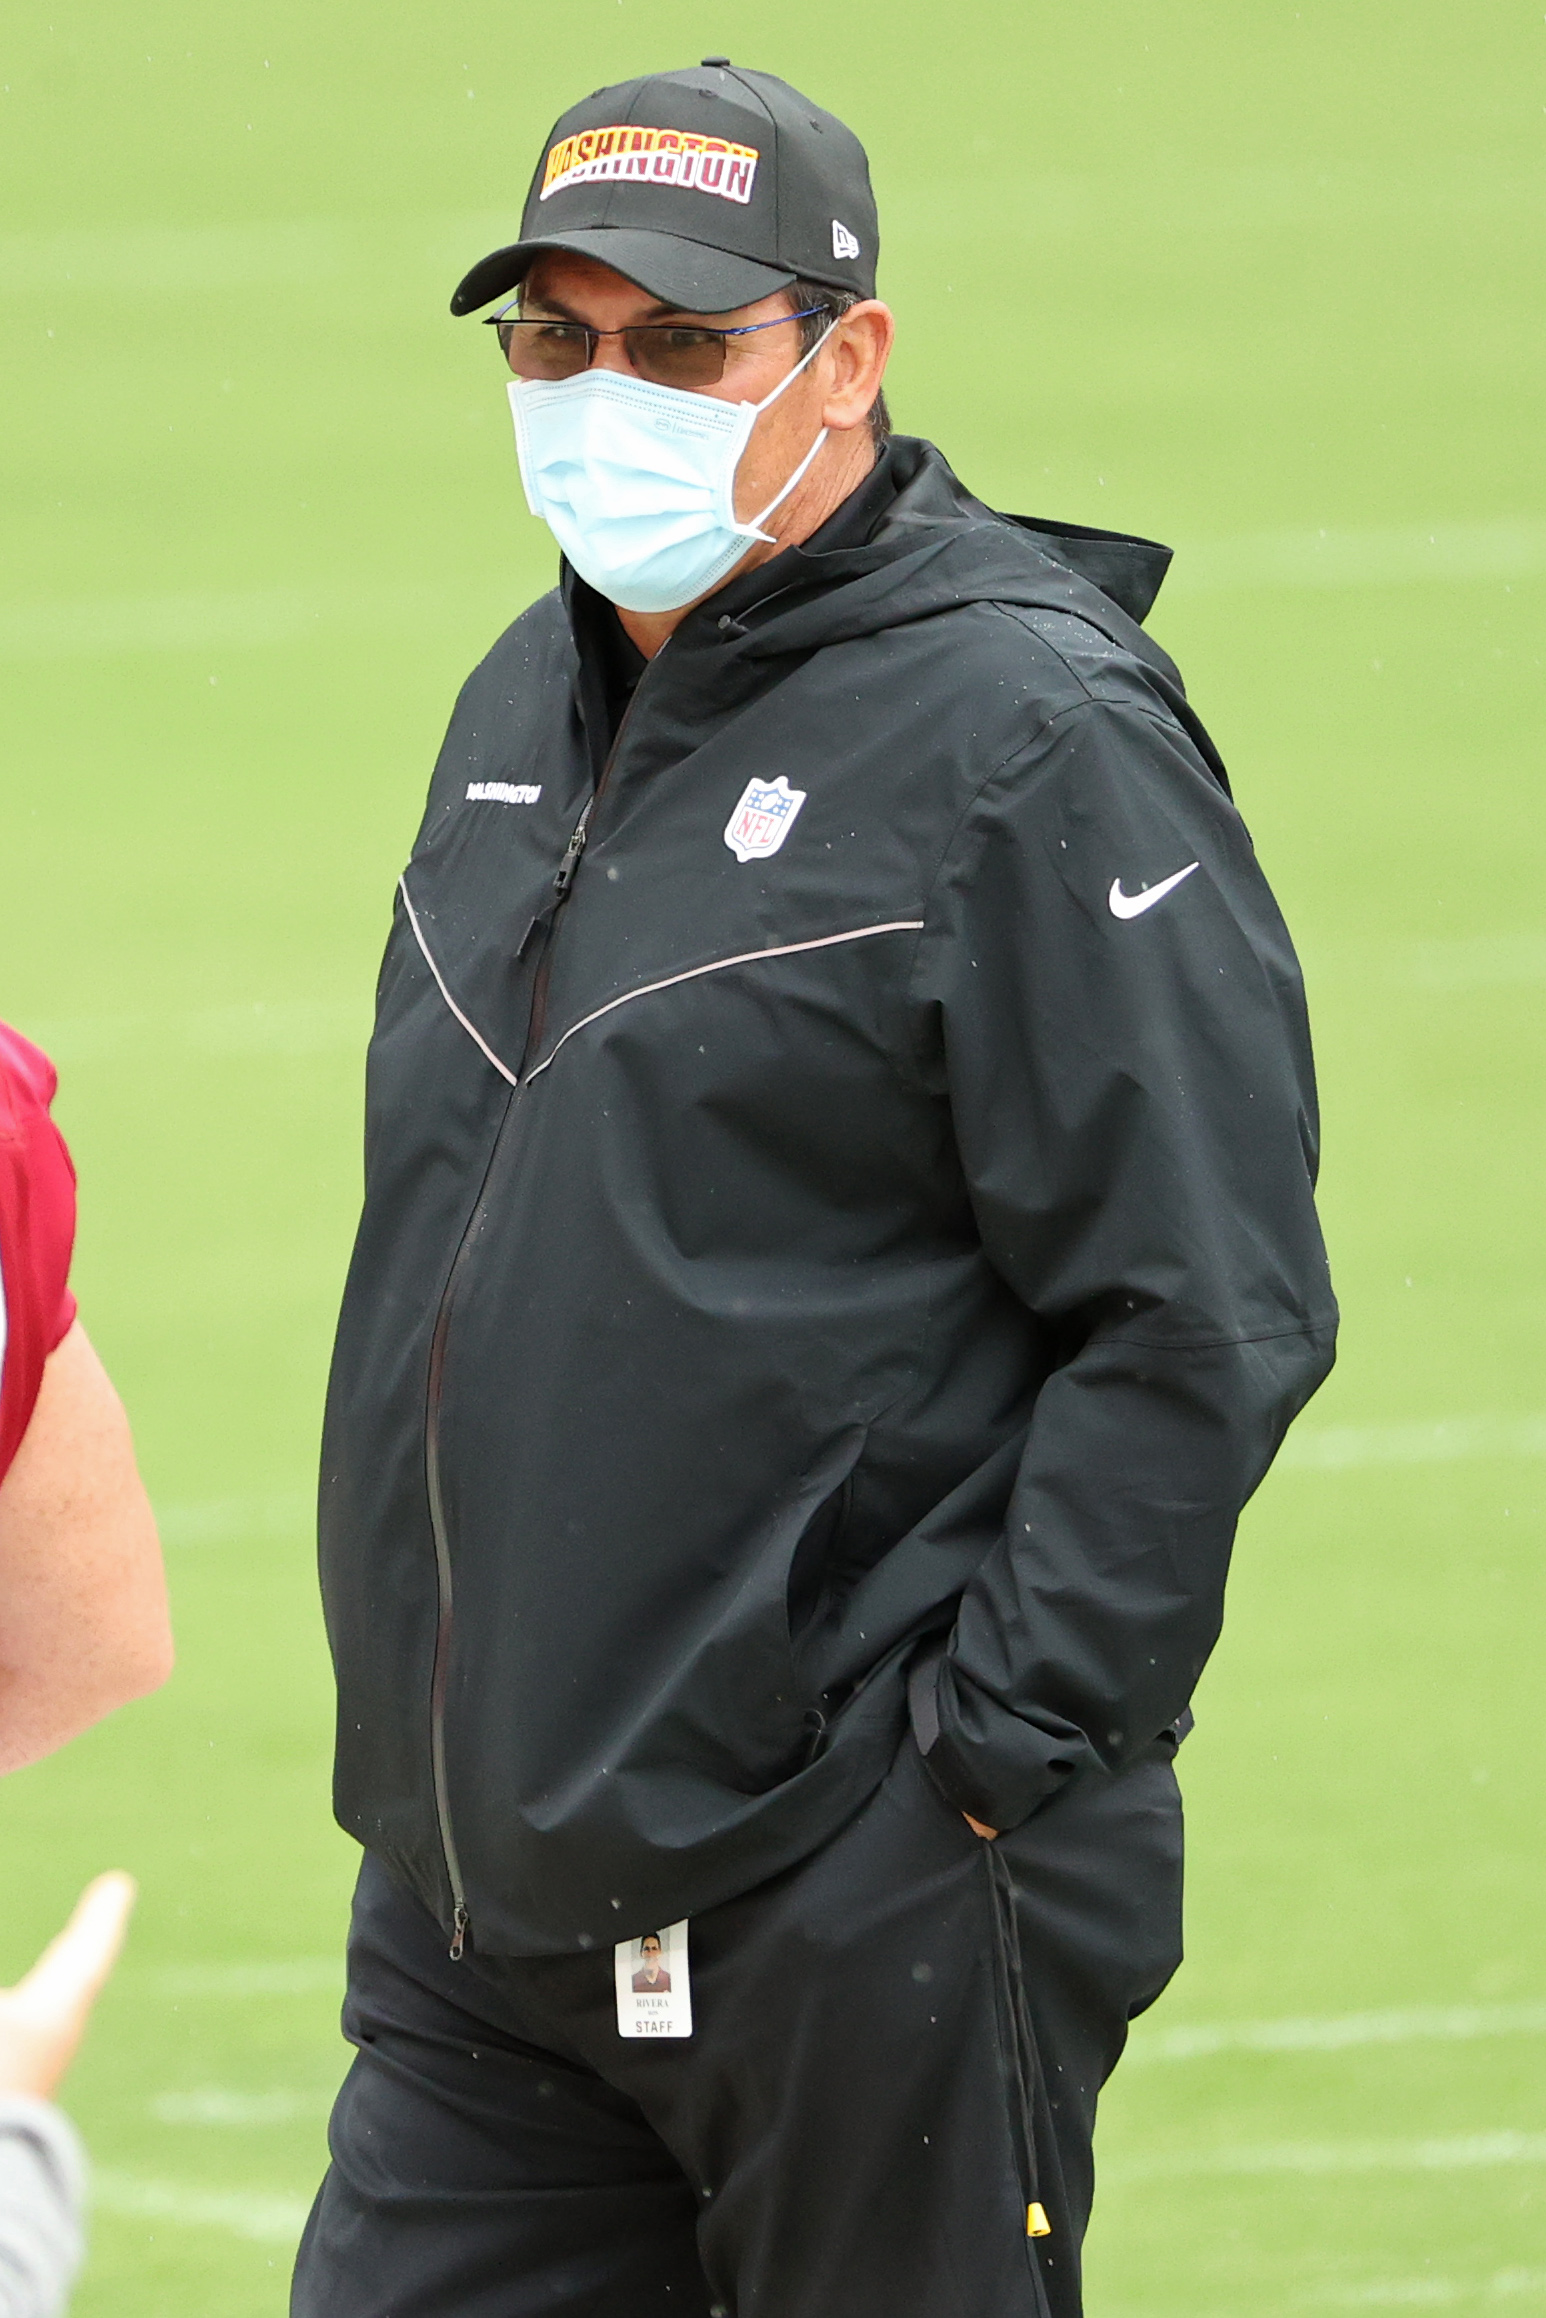 NFL: The Washington Football Team-Srimmage